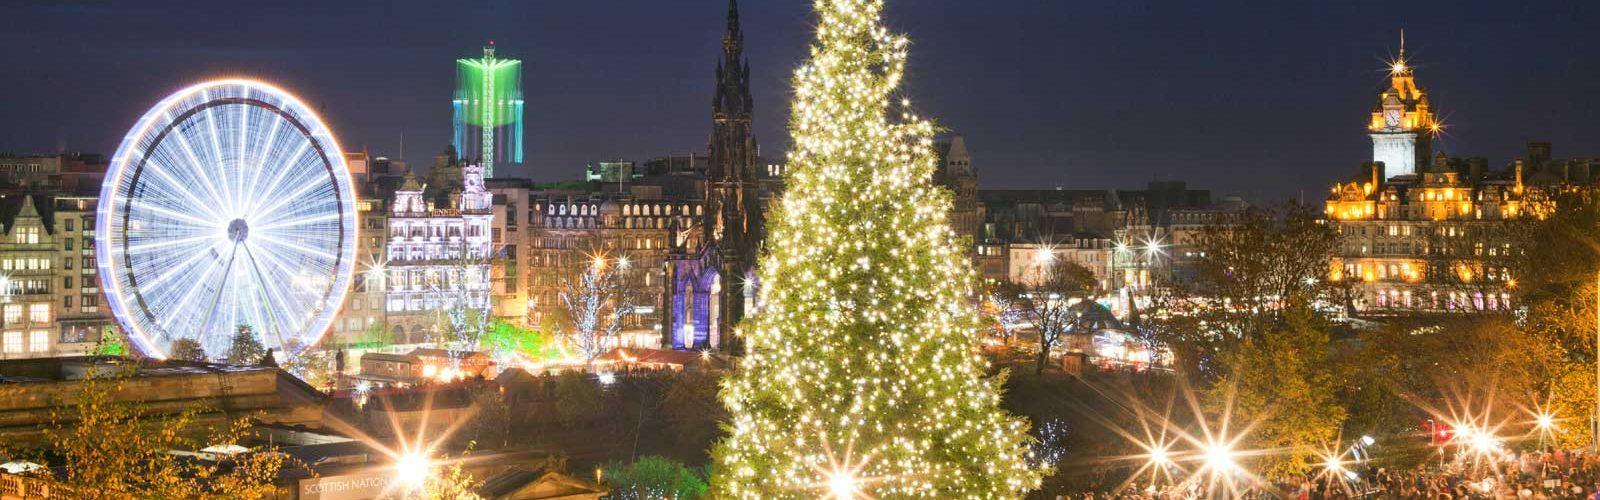 Edinburgh at night with Christmas lights